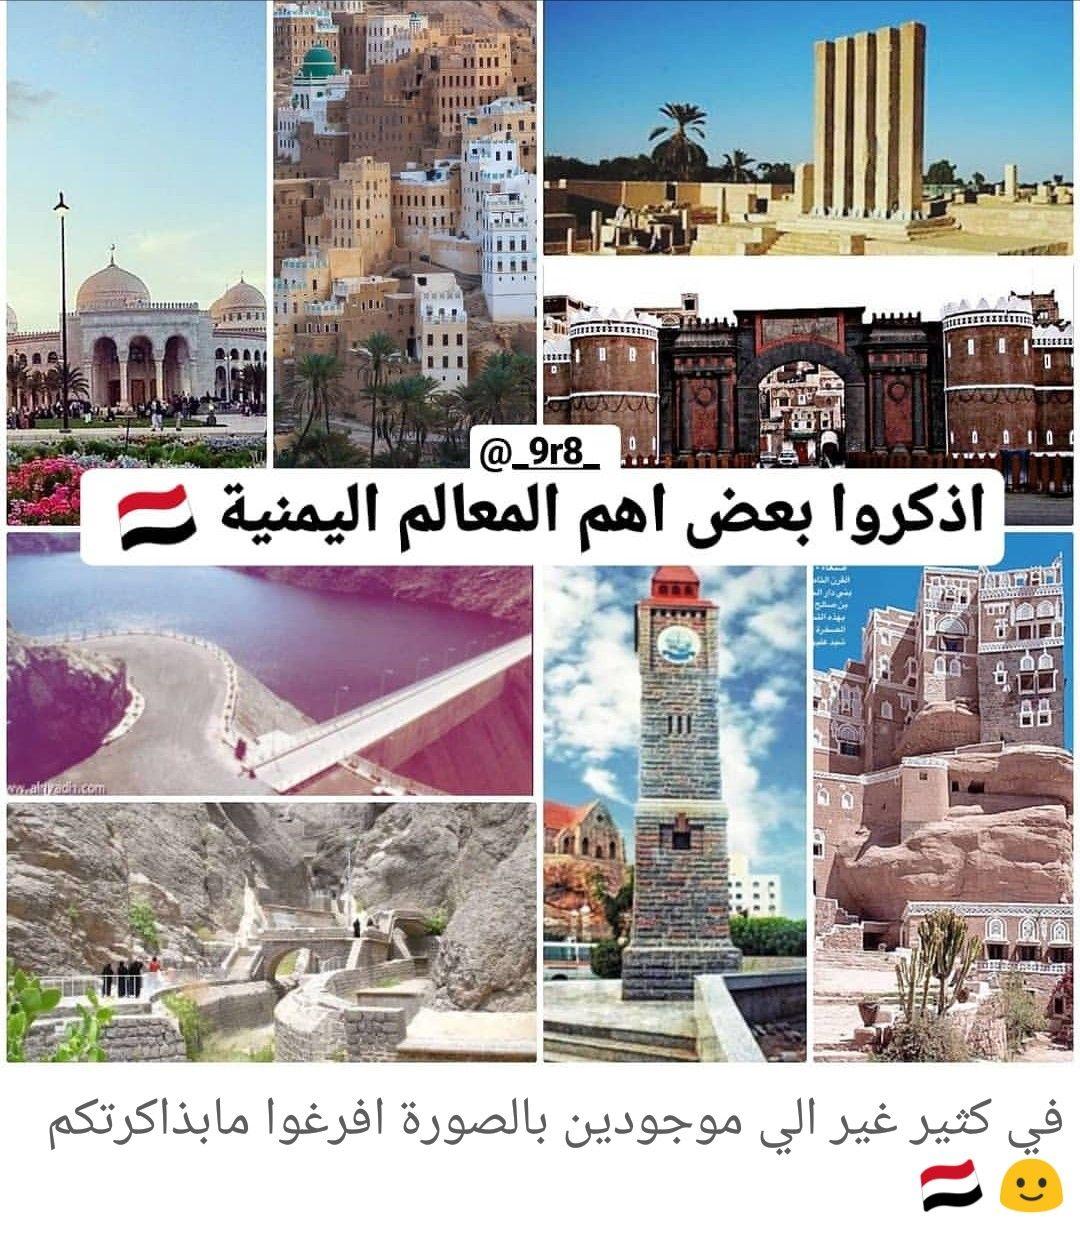 Pin By Hanan Alhajj On اليمن Places Around The World Yemen Around The Worlds